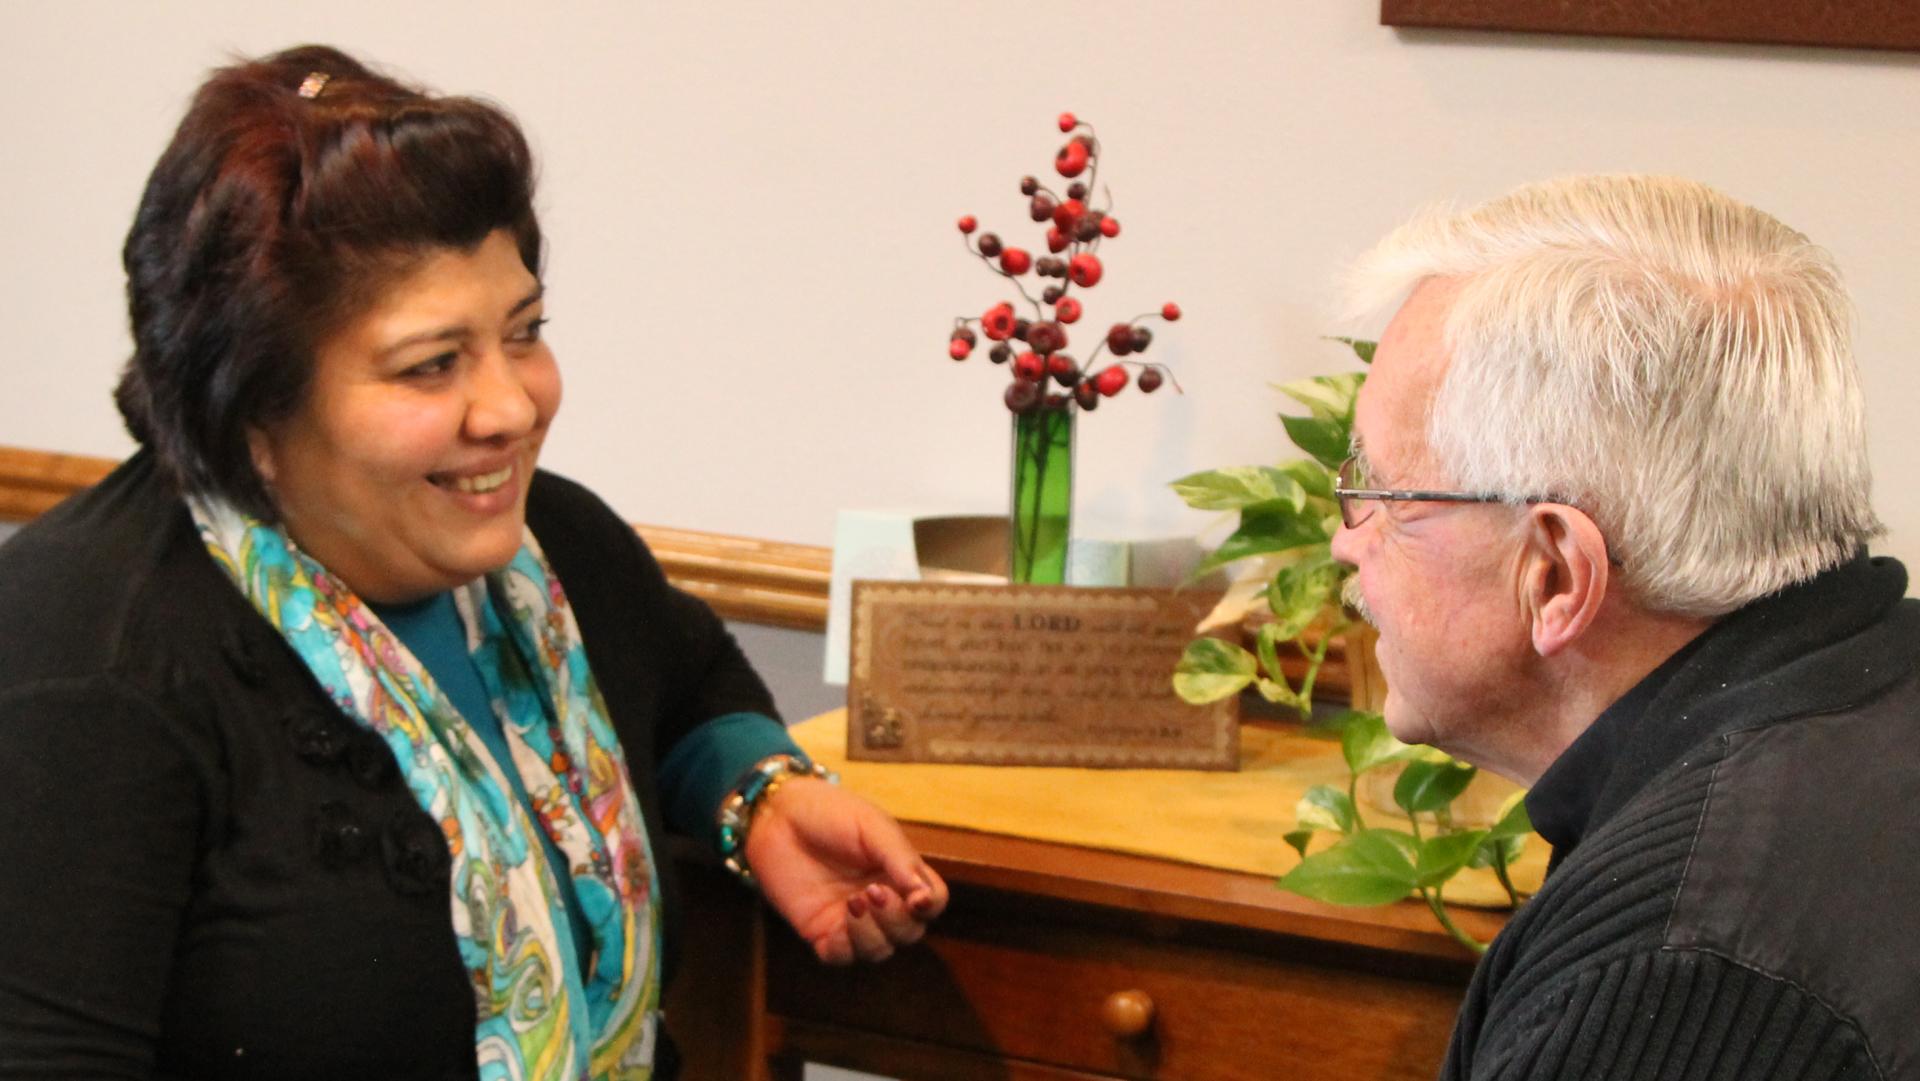 Reconciliation/Confession